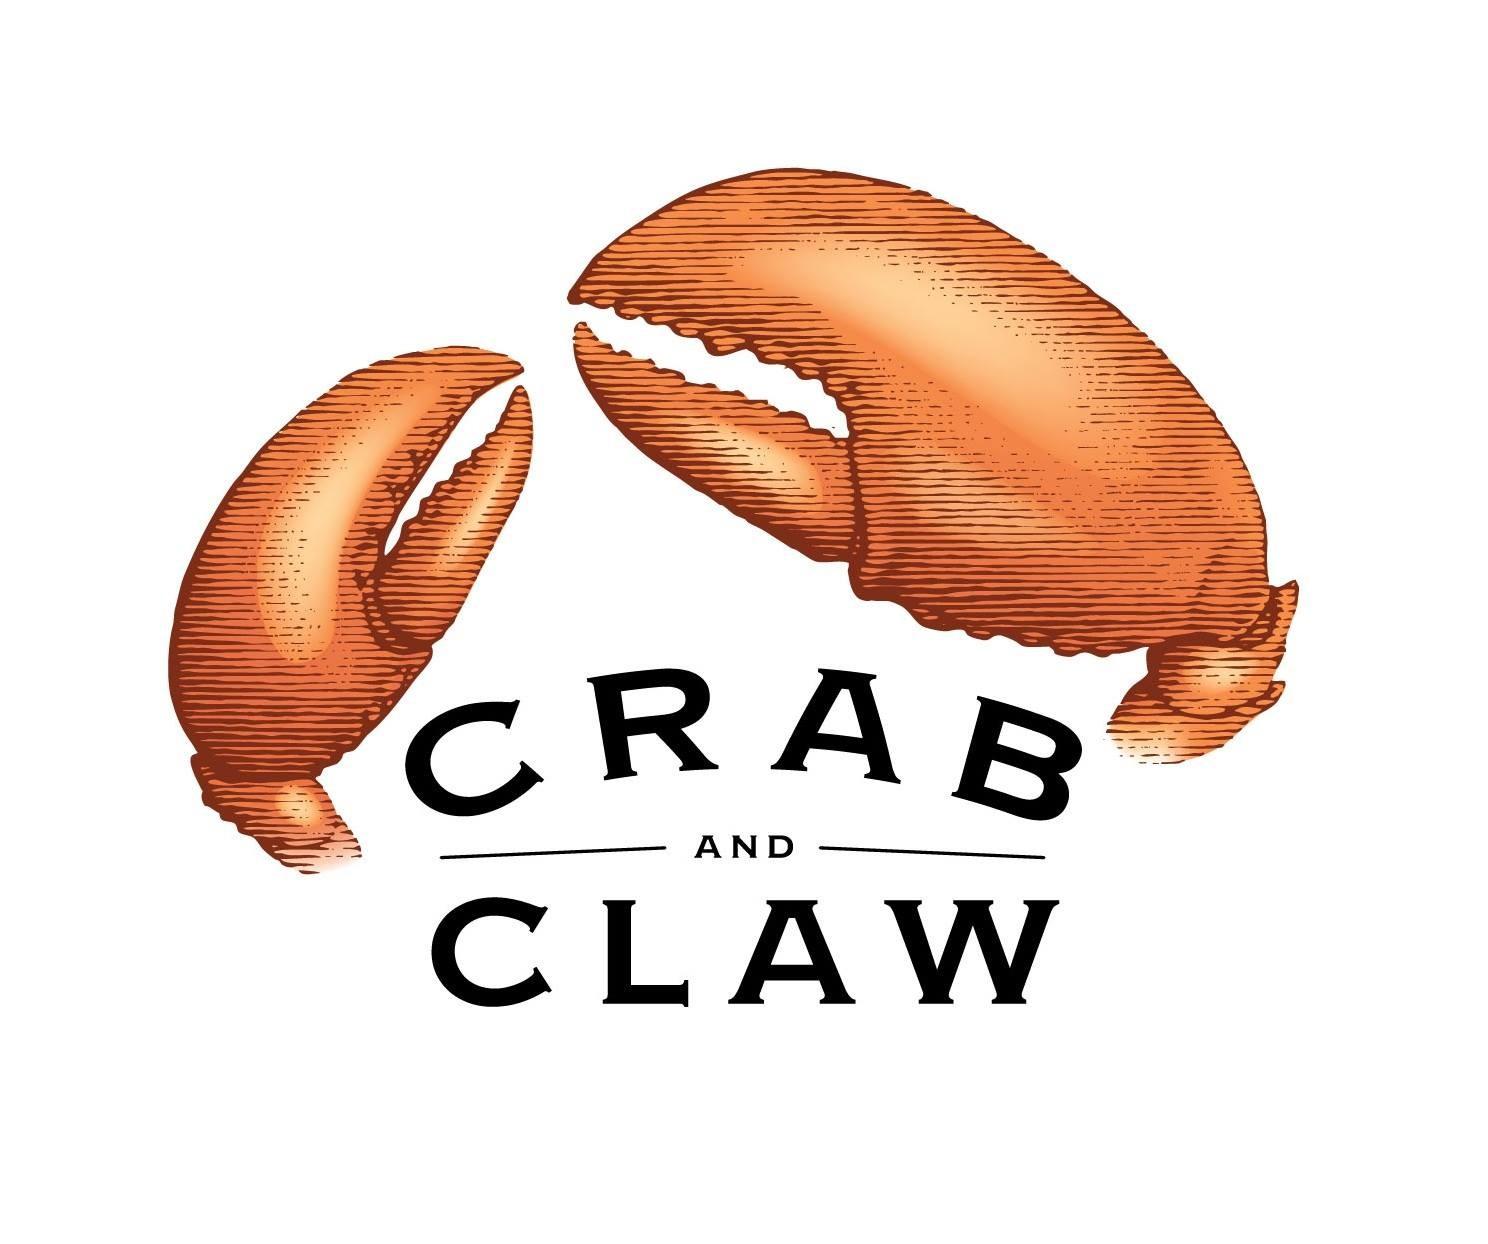 Crab & Claw (แคร็บ แอนด์ คลอว์)